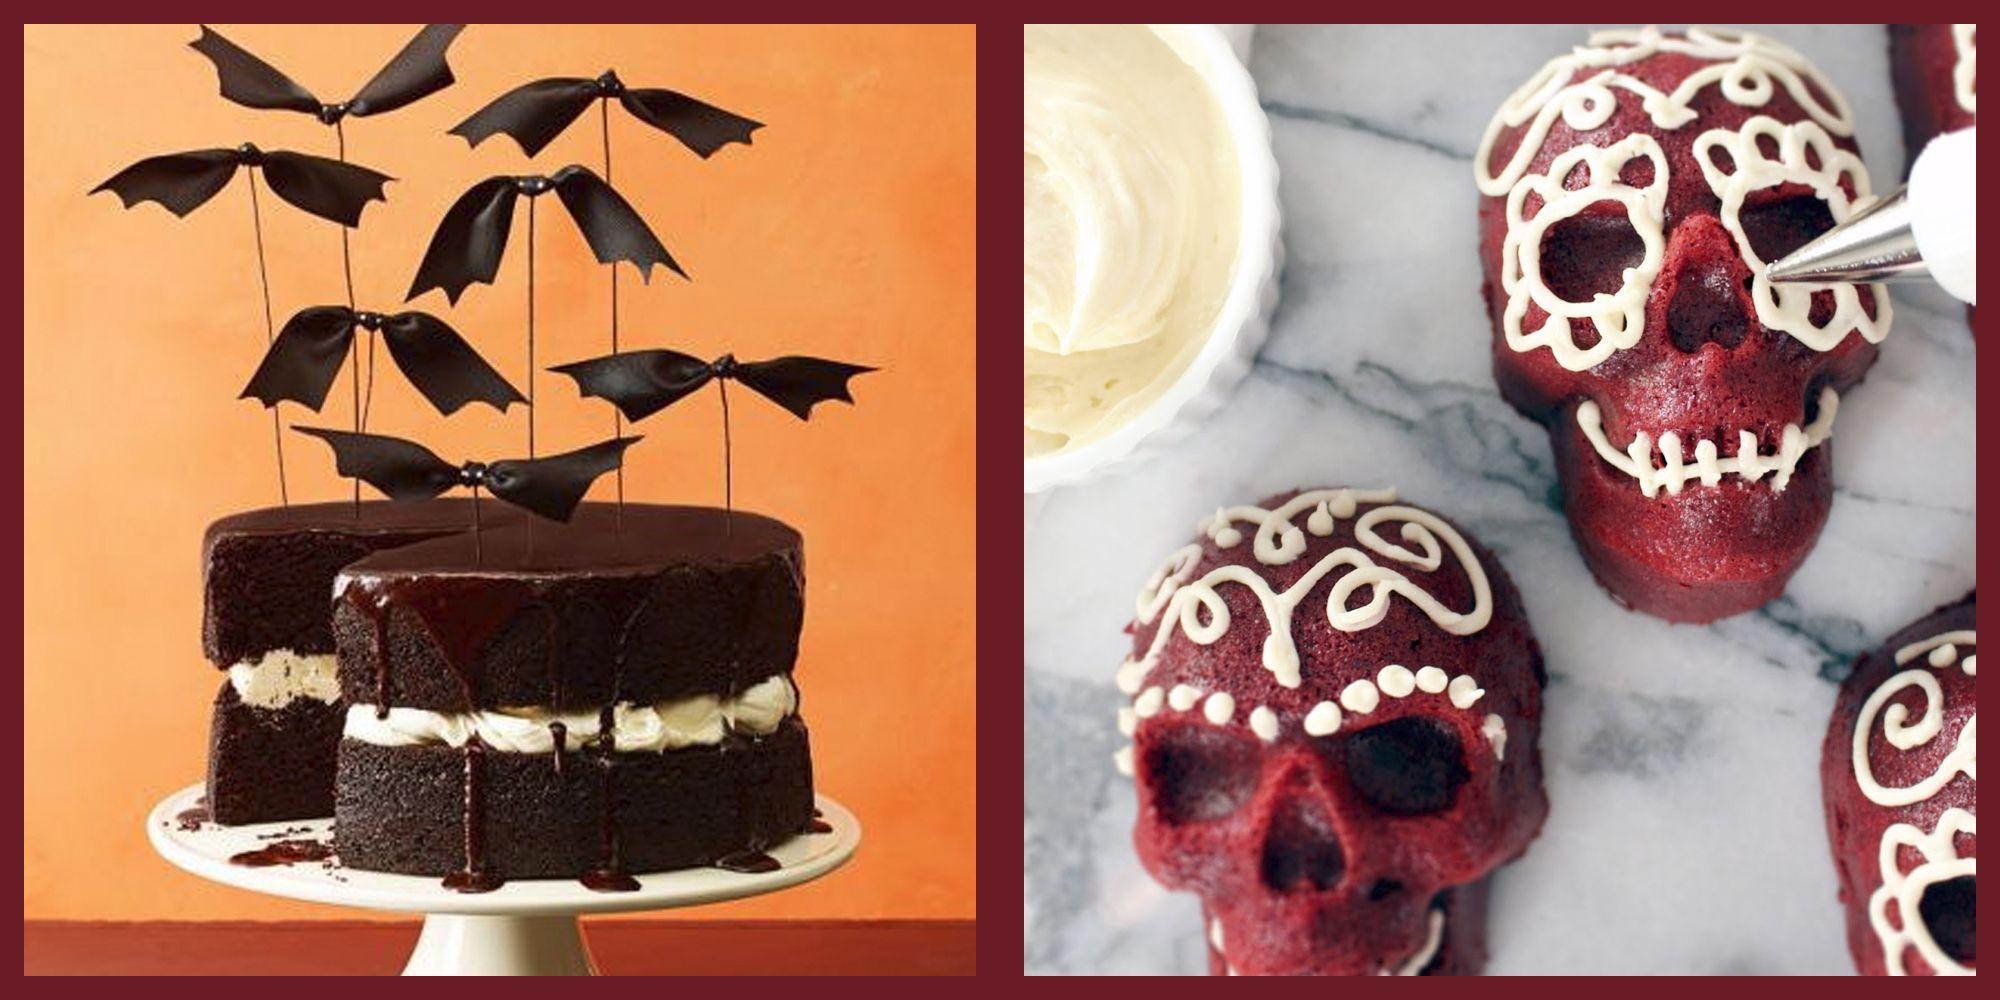 Best Halloween Party Desserts.26 Best Halloween Desserts In 2020 Easy Recipes For Halloween Sweets